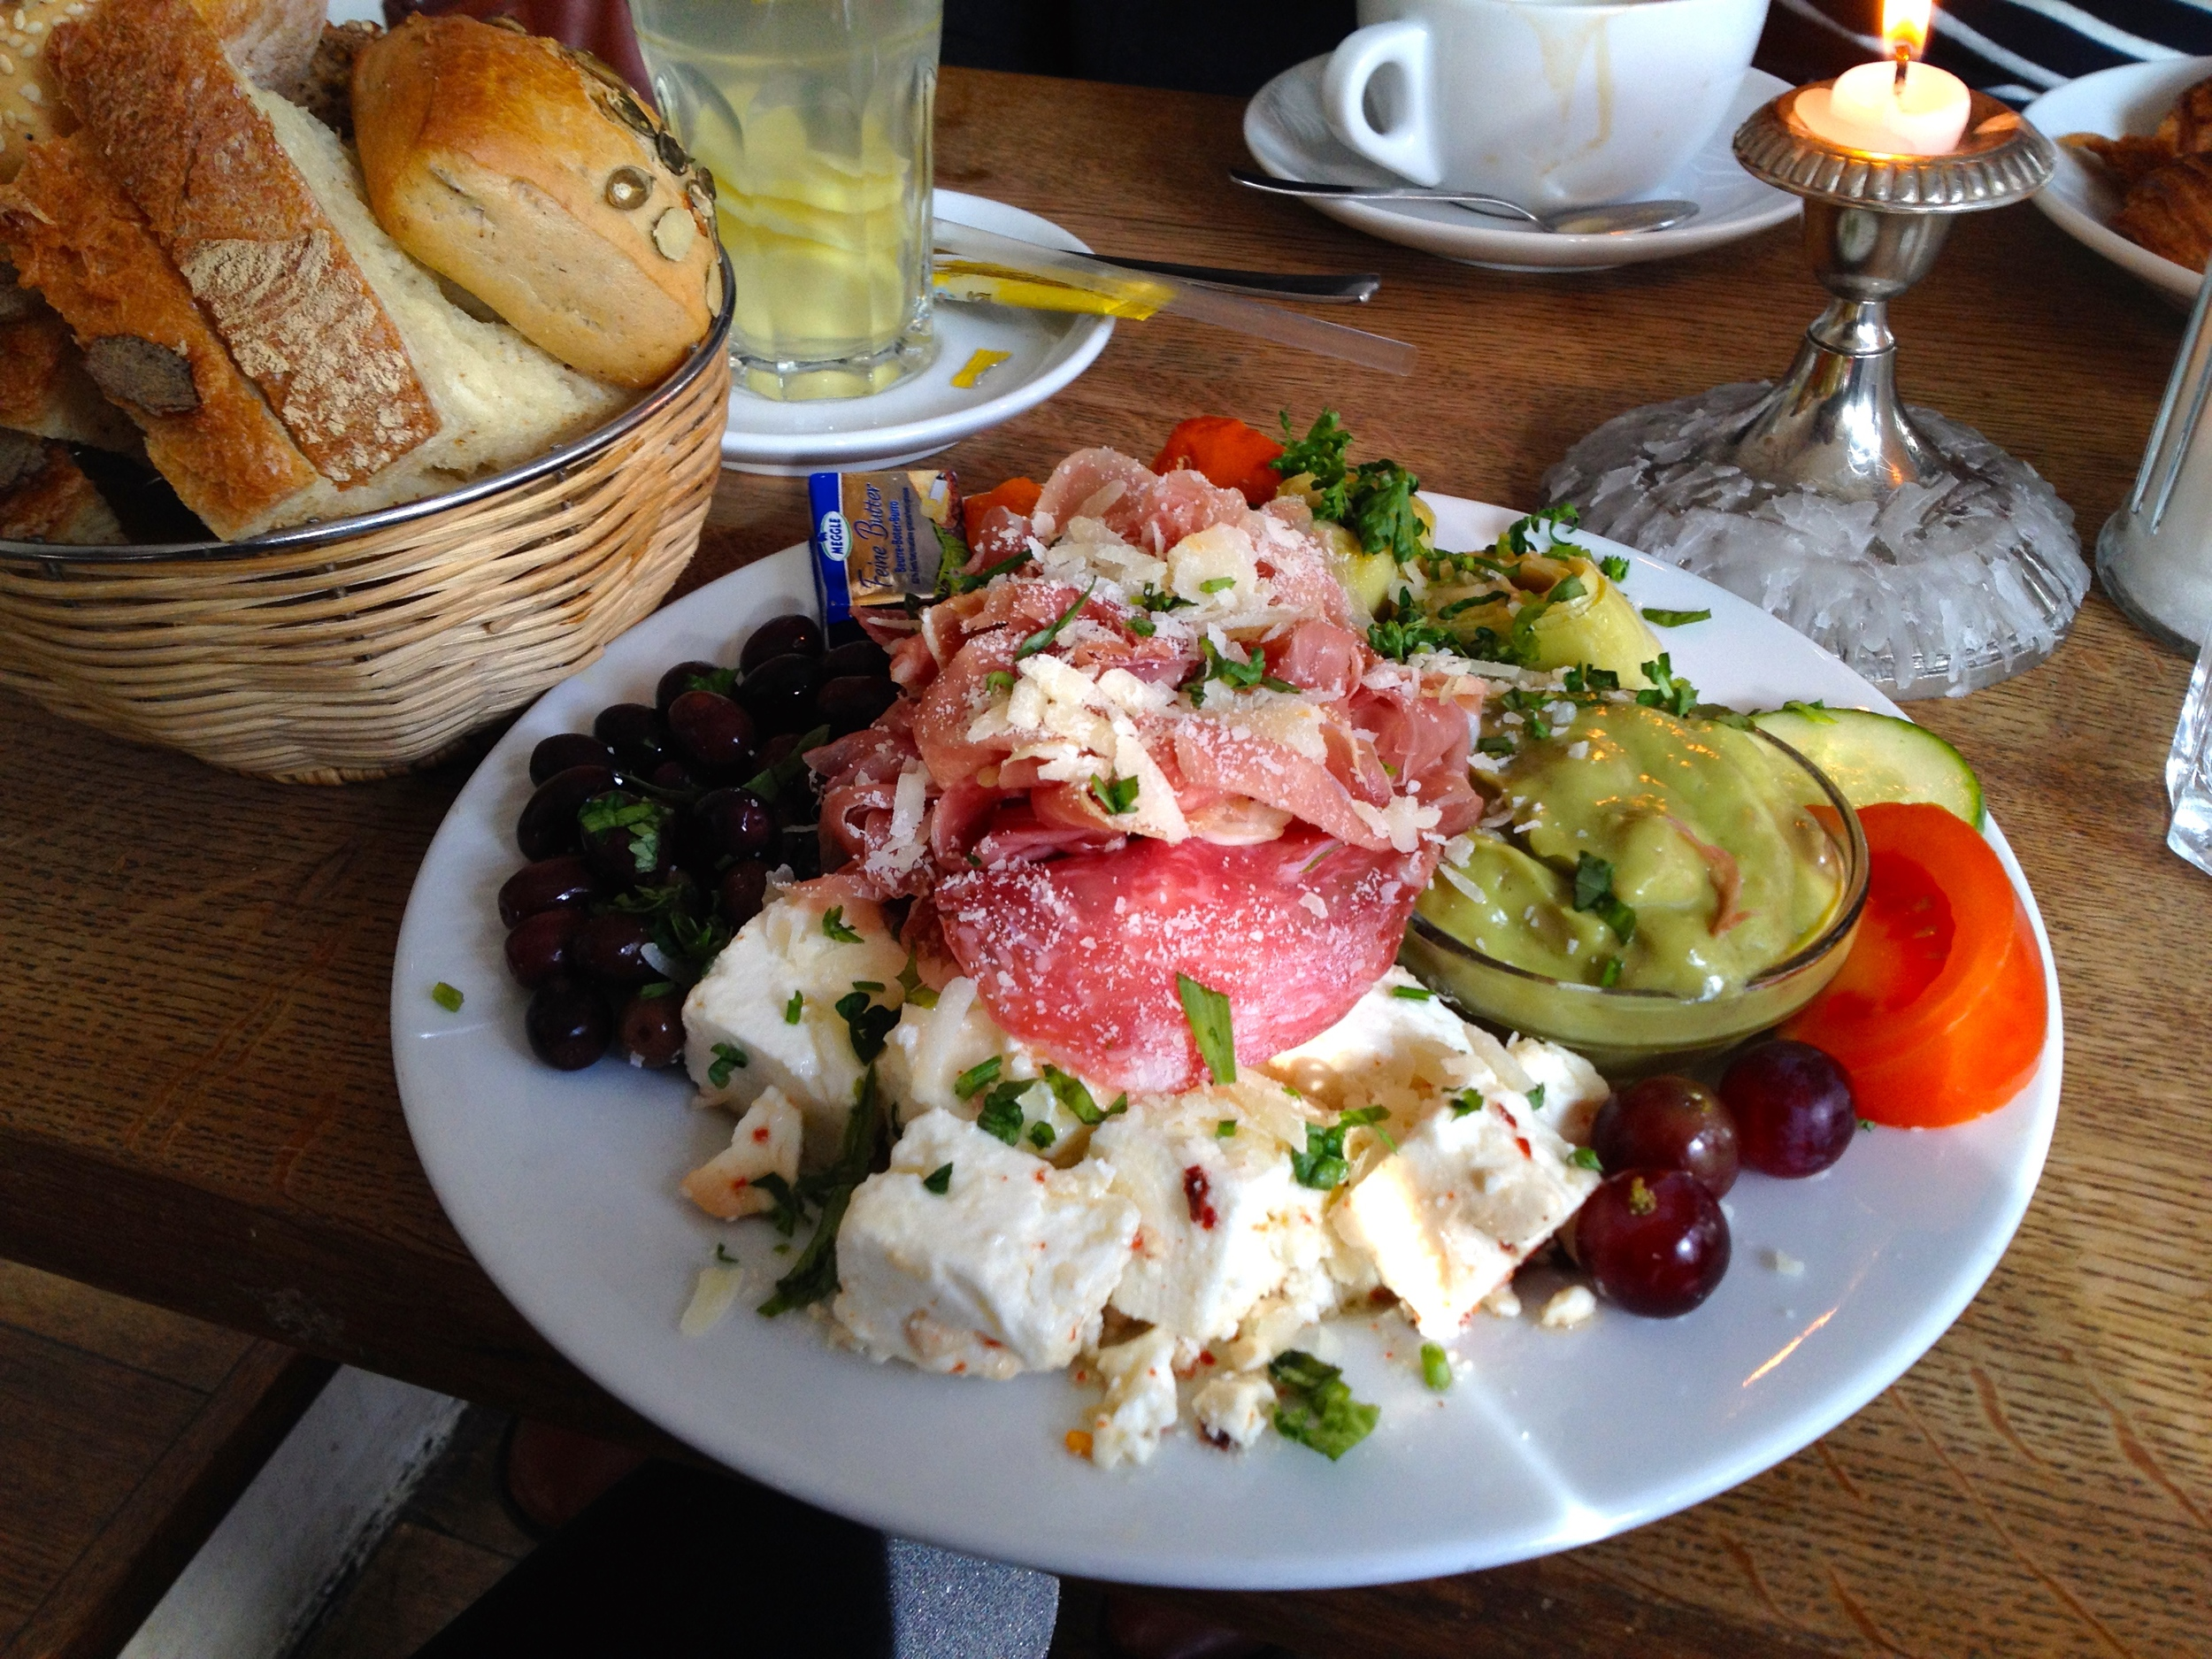 My Mediterranean breakfast platter